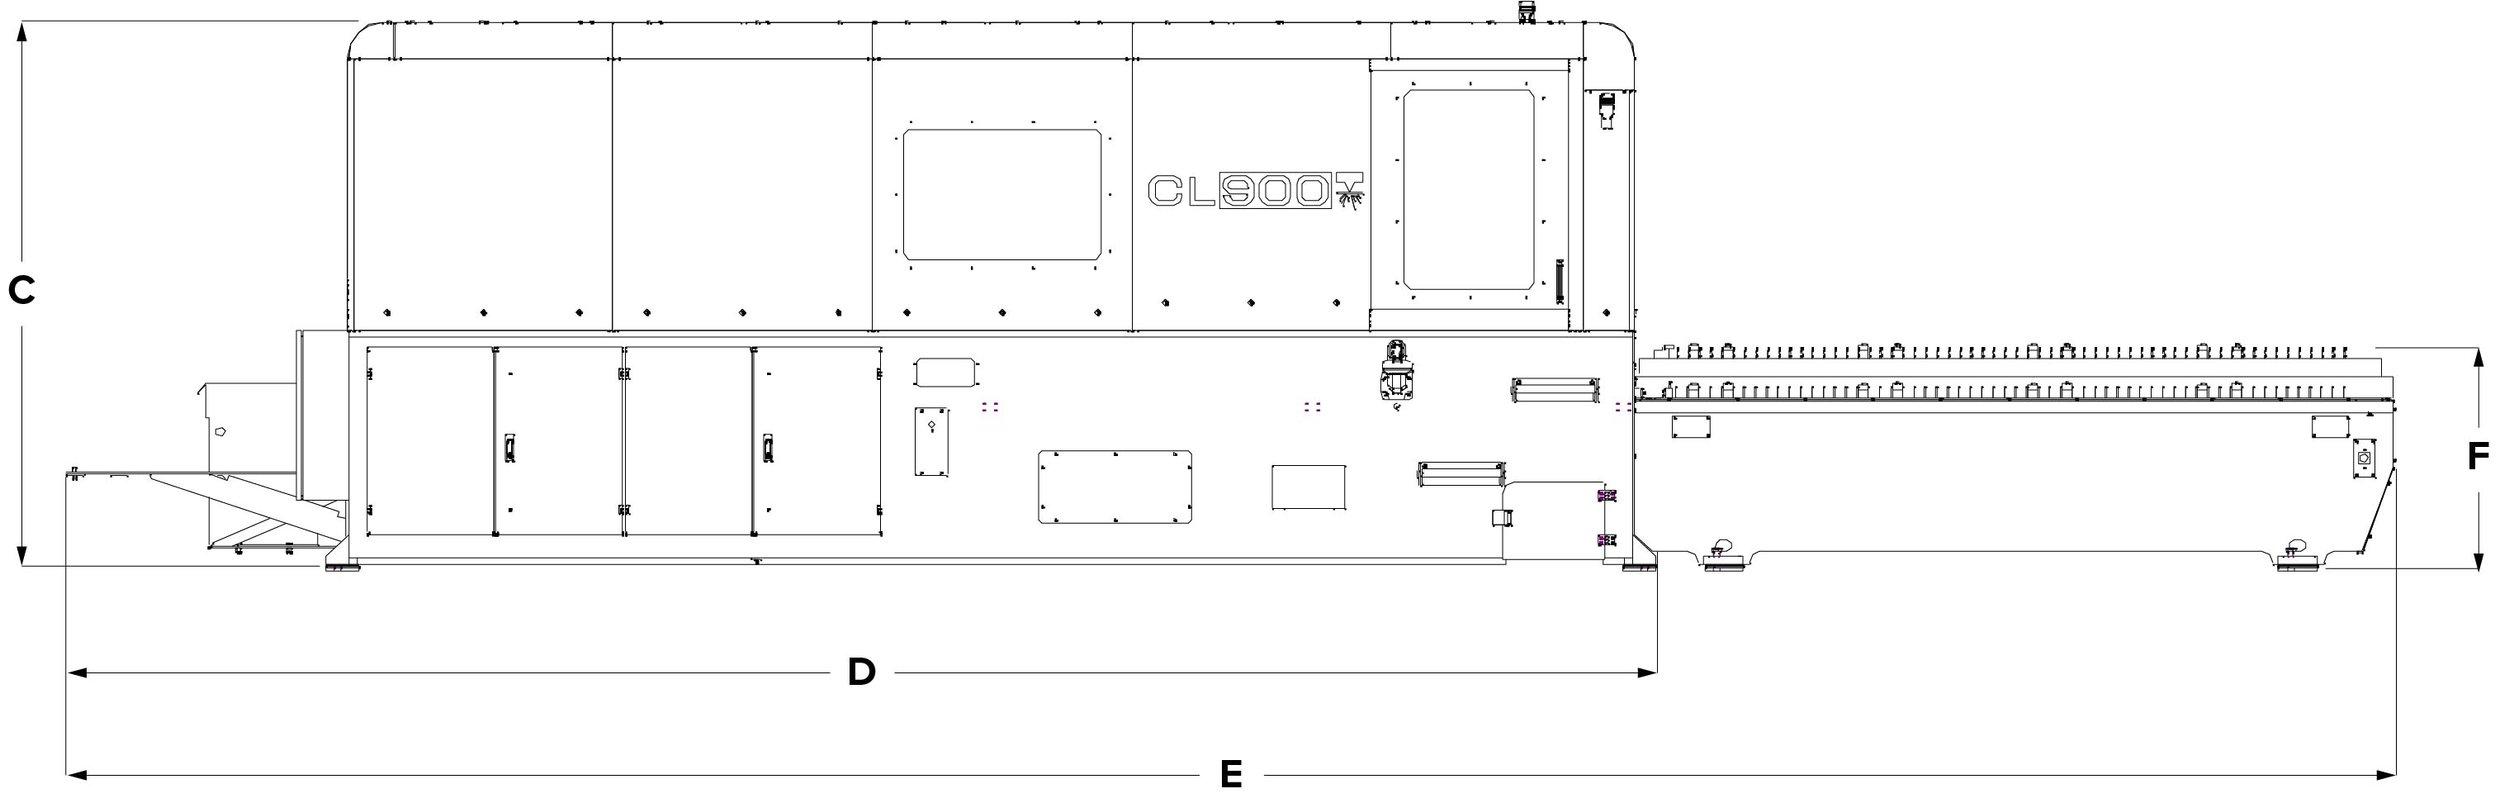 CL900 (side) Foundation print